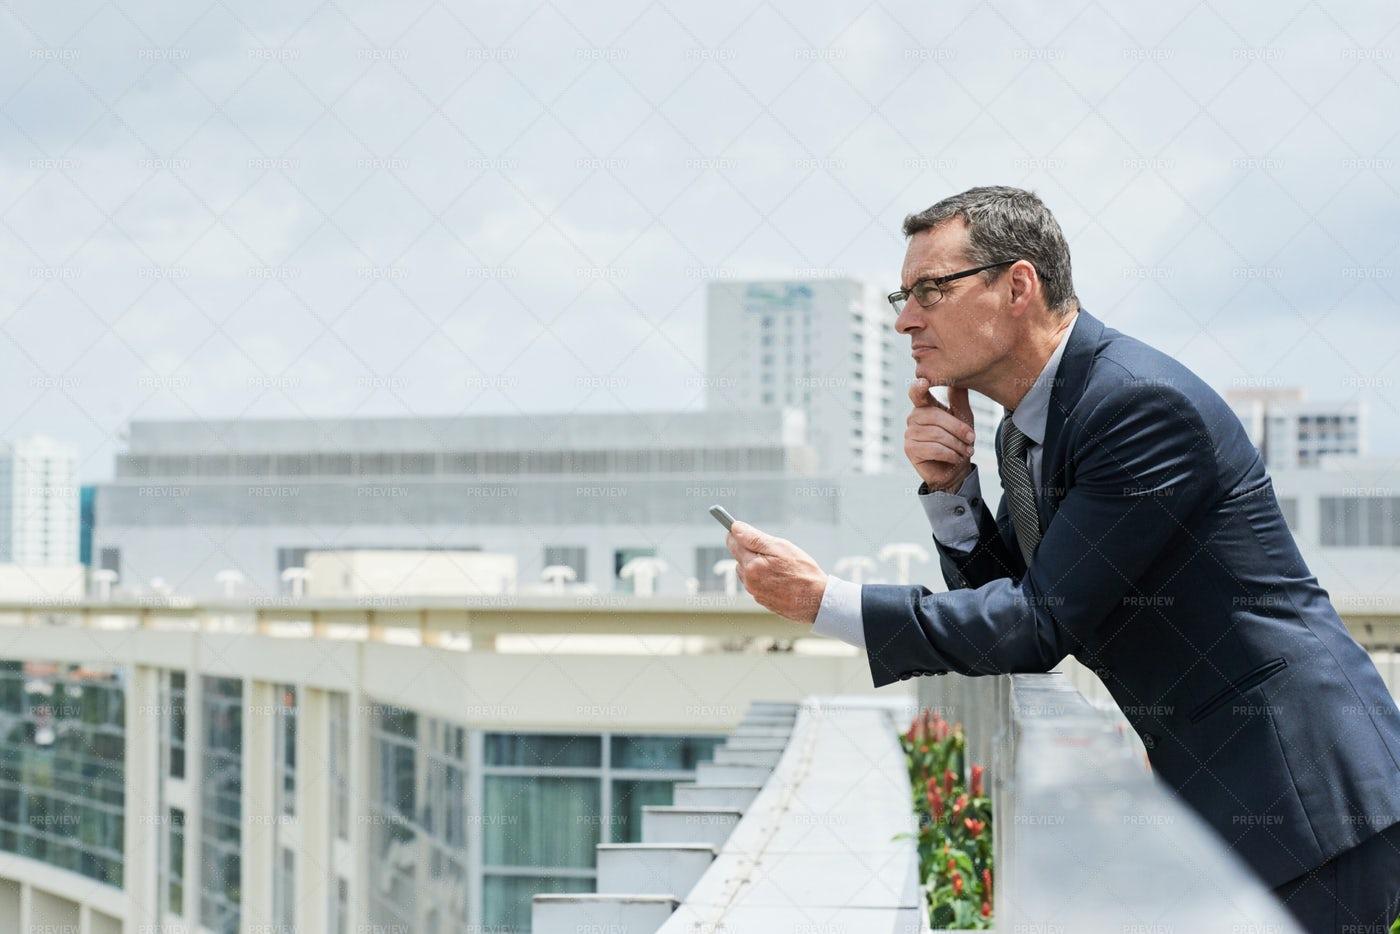 Thinking Ambitious Businessman: Stock Photos